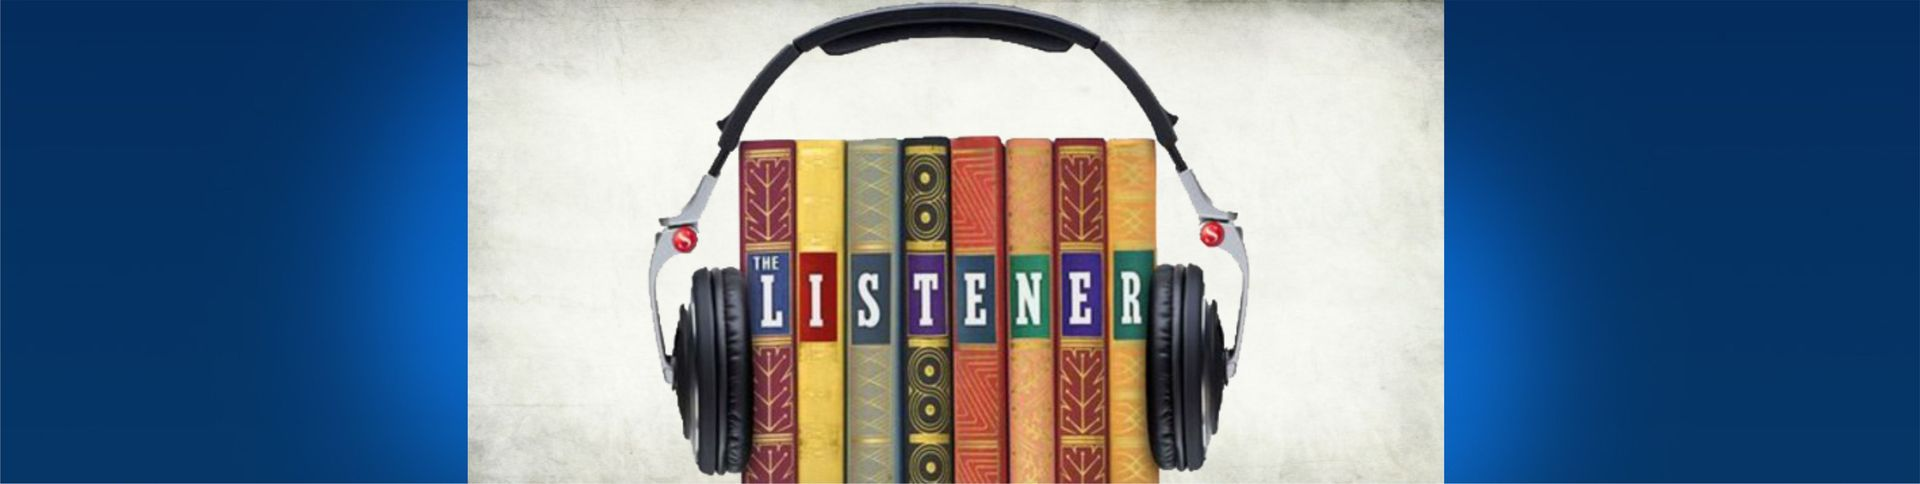 Audiocursos. central de cursos